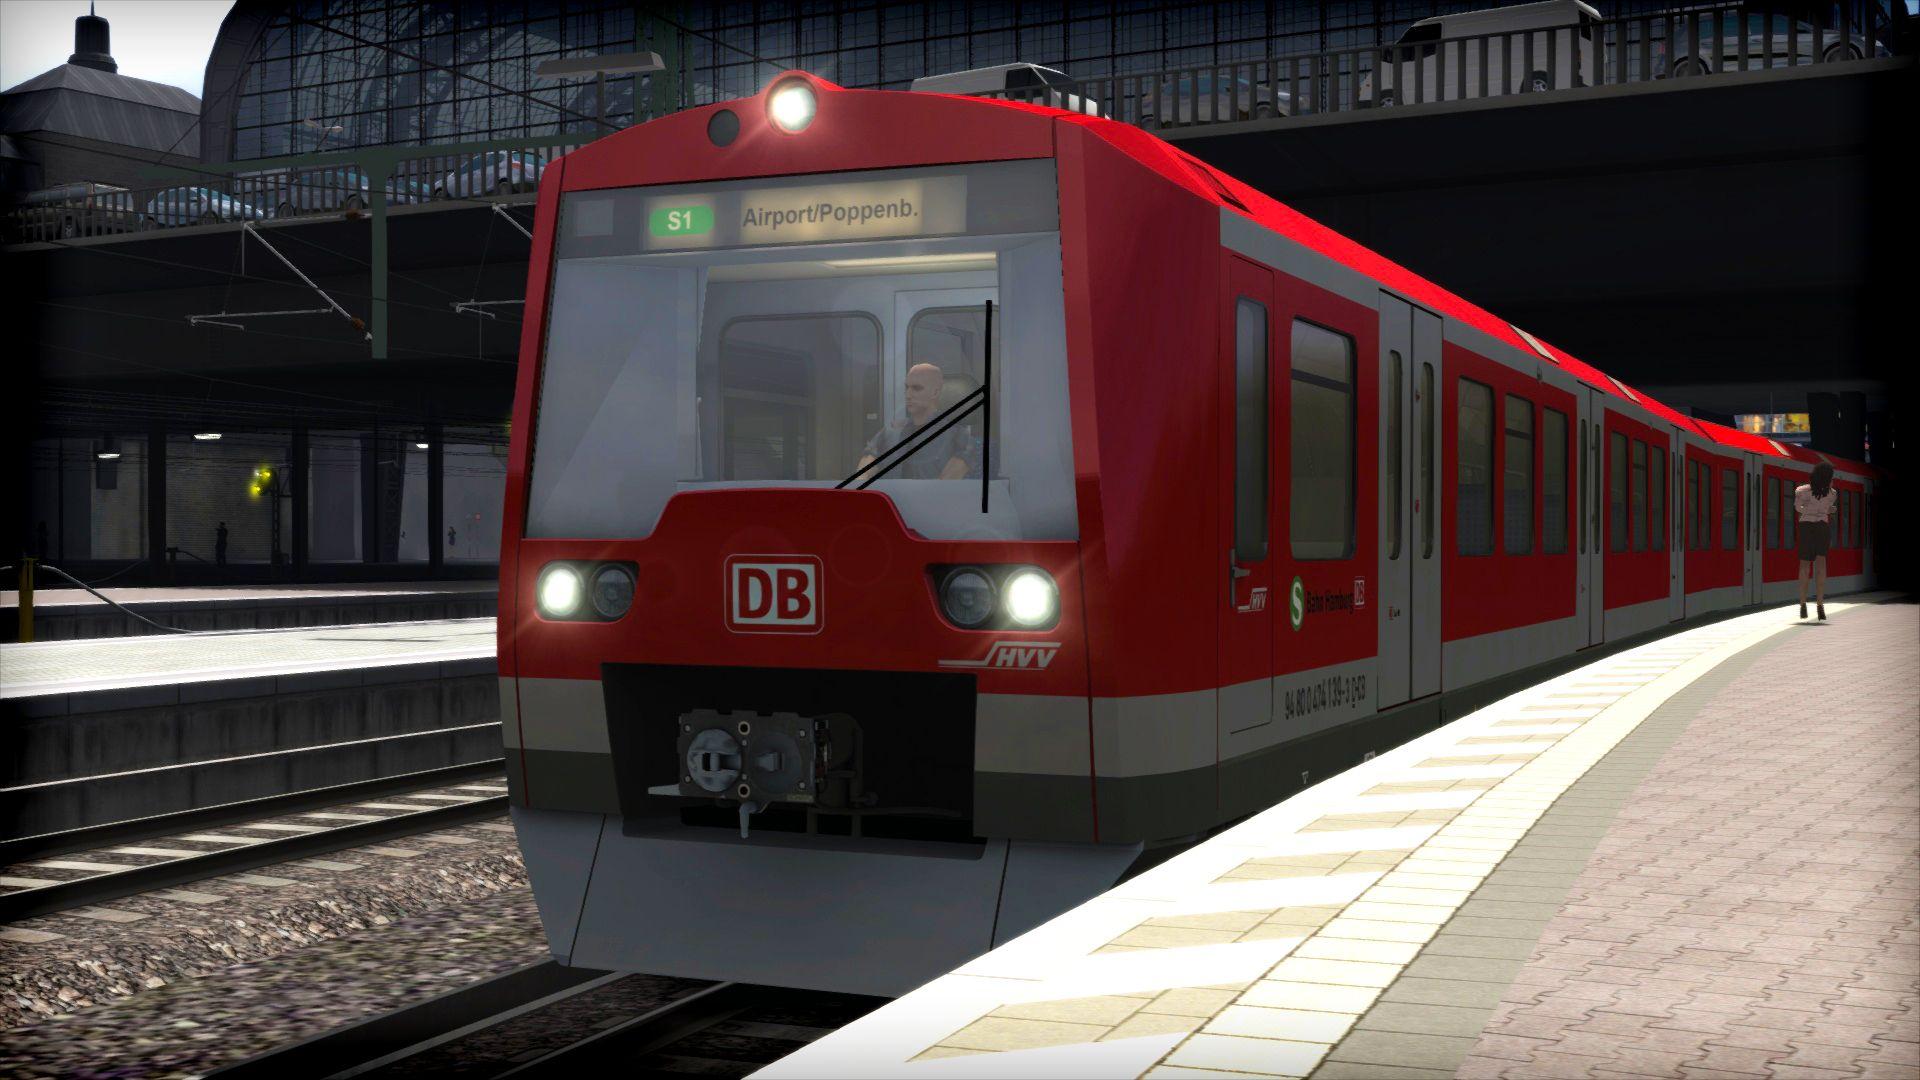 DB4742